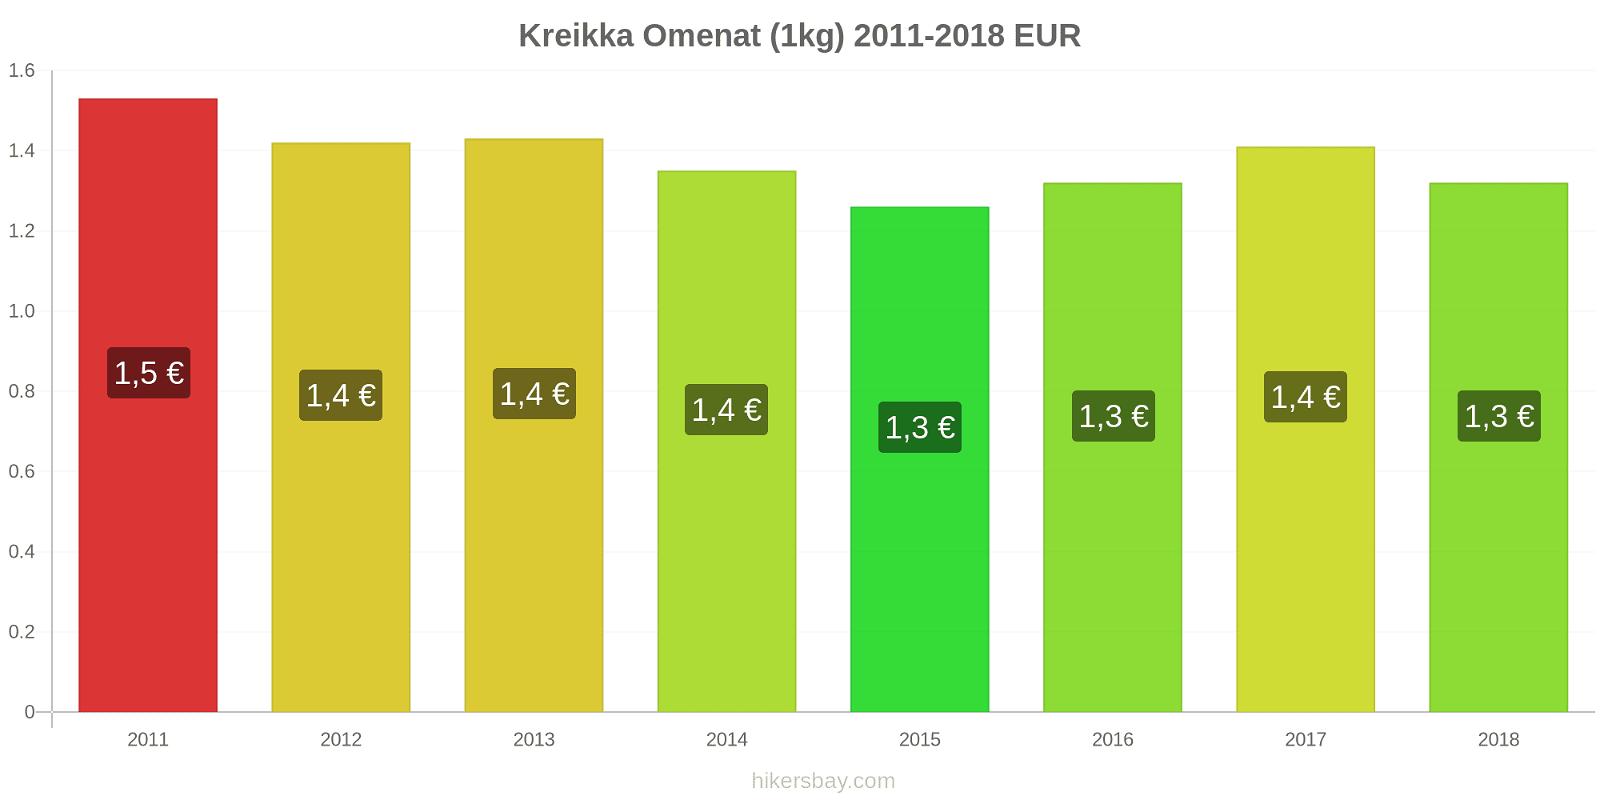 Kreikka hintojen muutokset Omenat (1kg) hikersbay.com